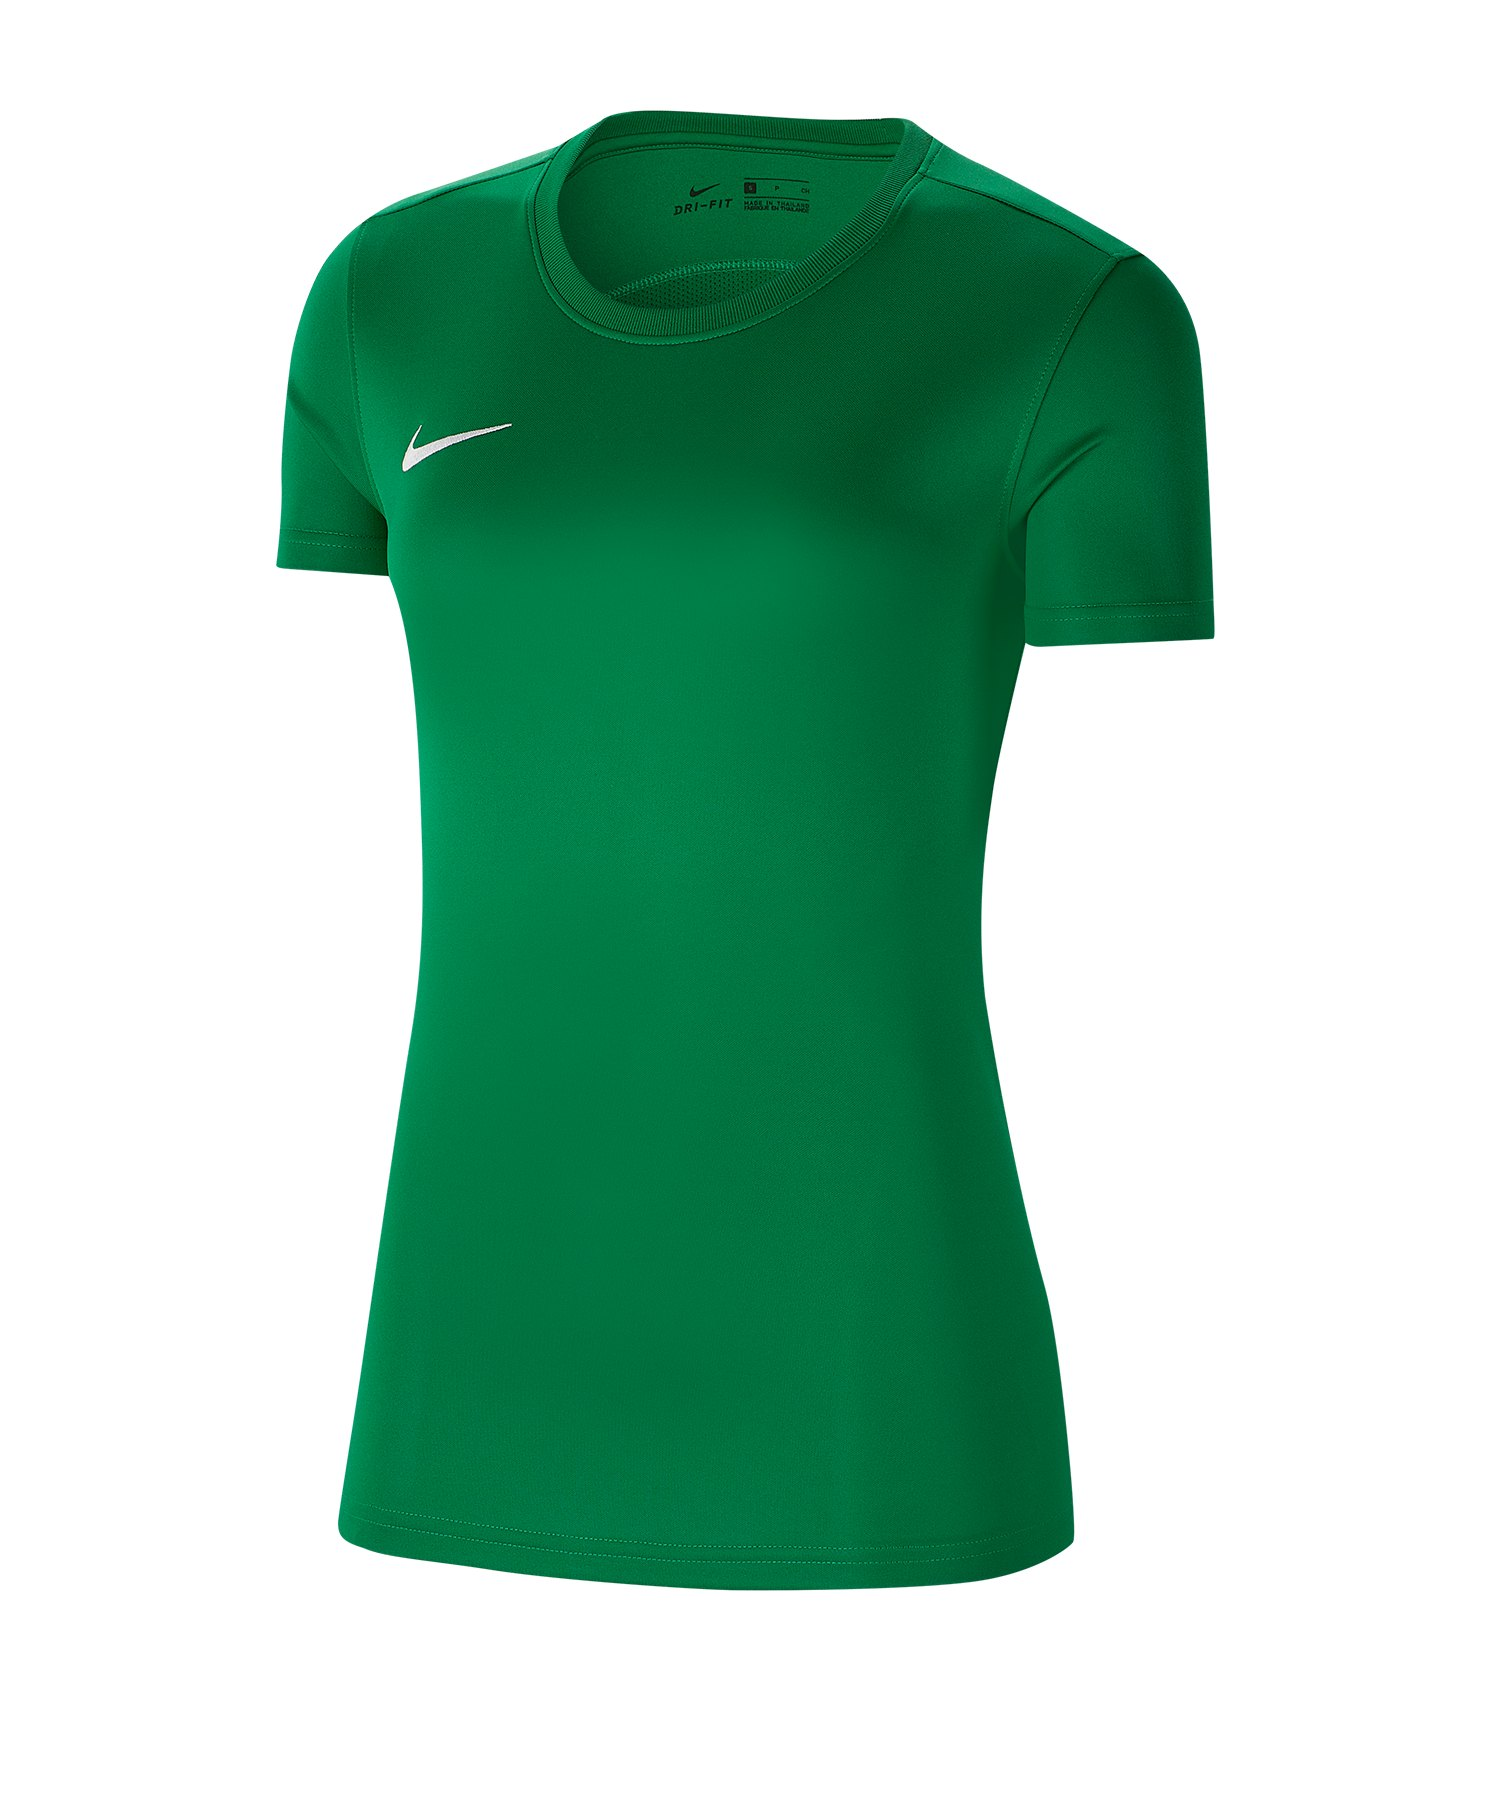 Nike Park VII Trikot Damen Grün F341 - gruen